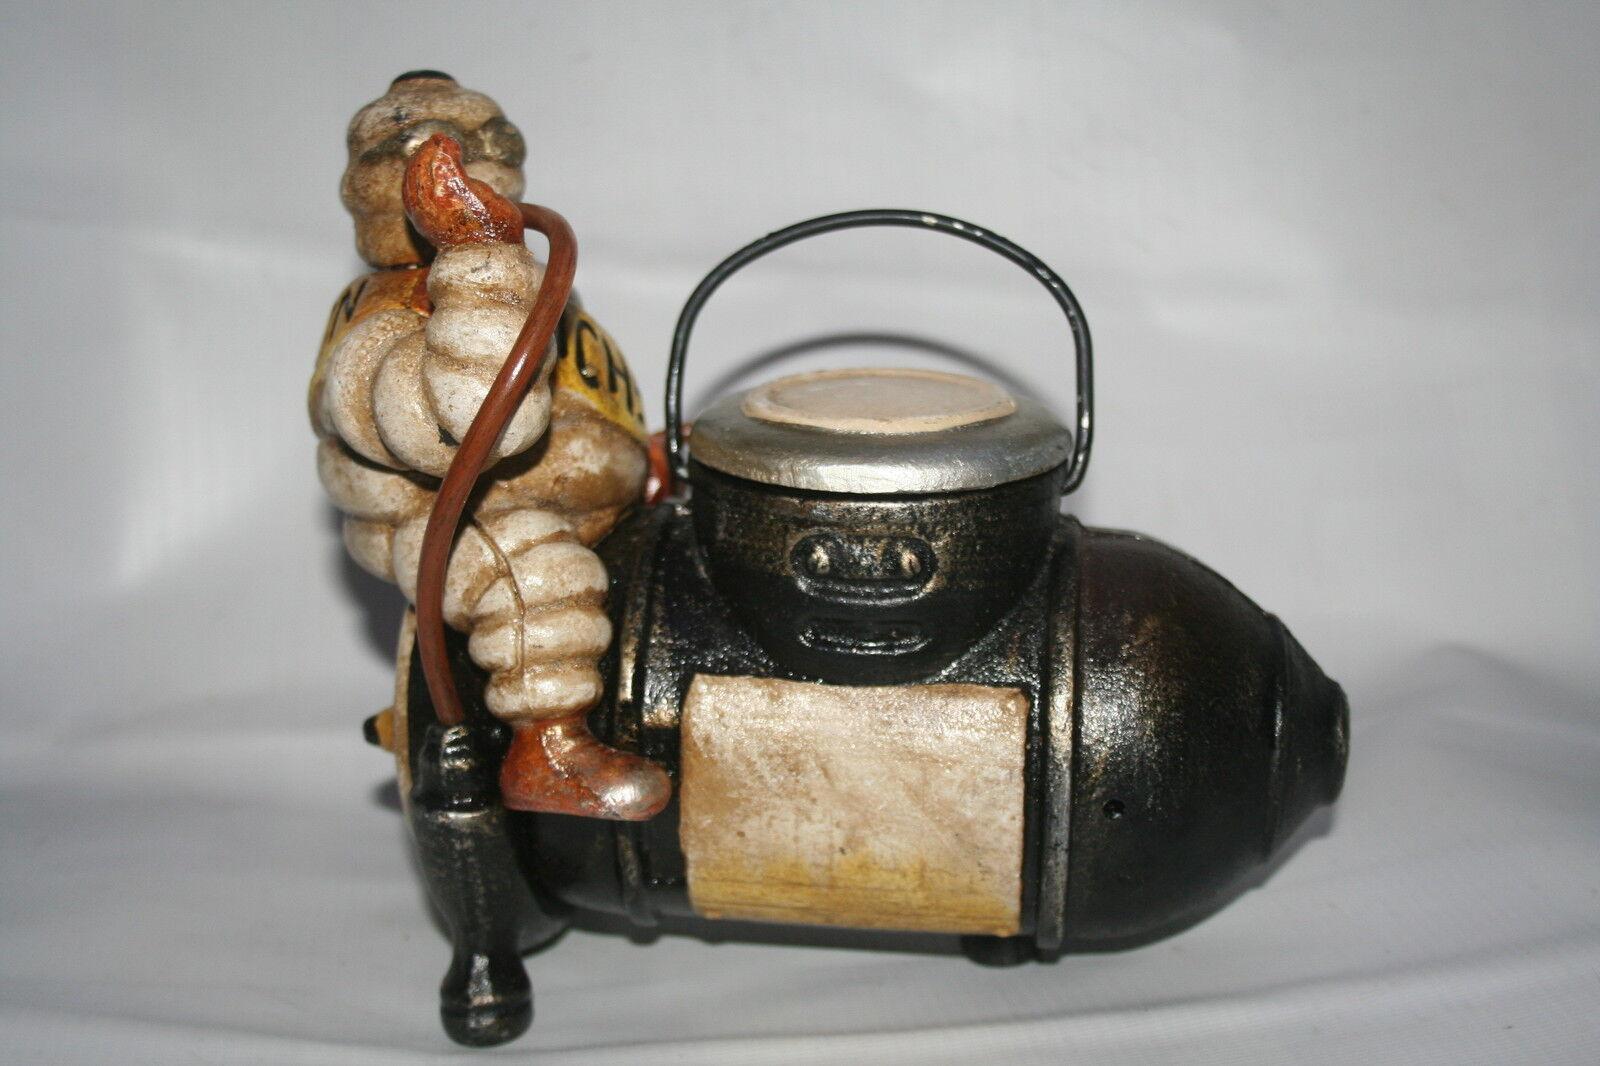 Michelin Man Compressor Figure Desk Tidy Vintage Style